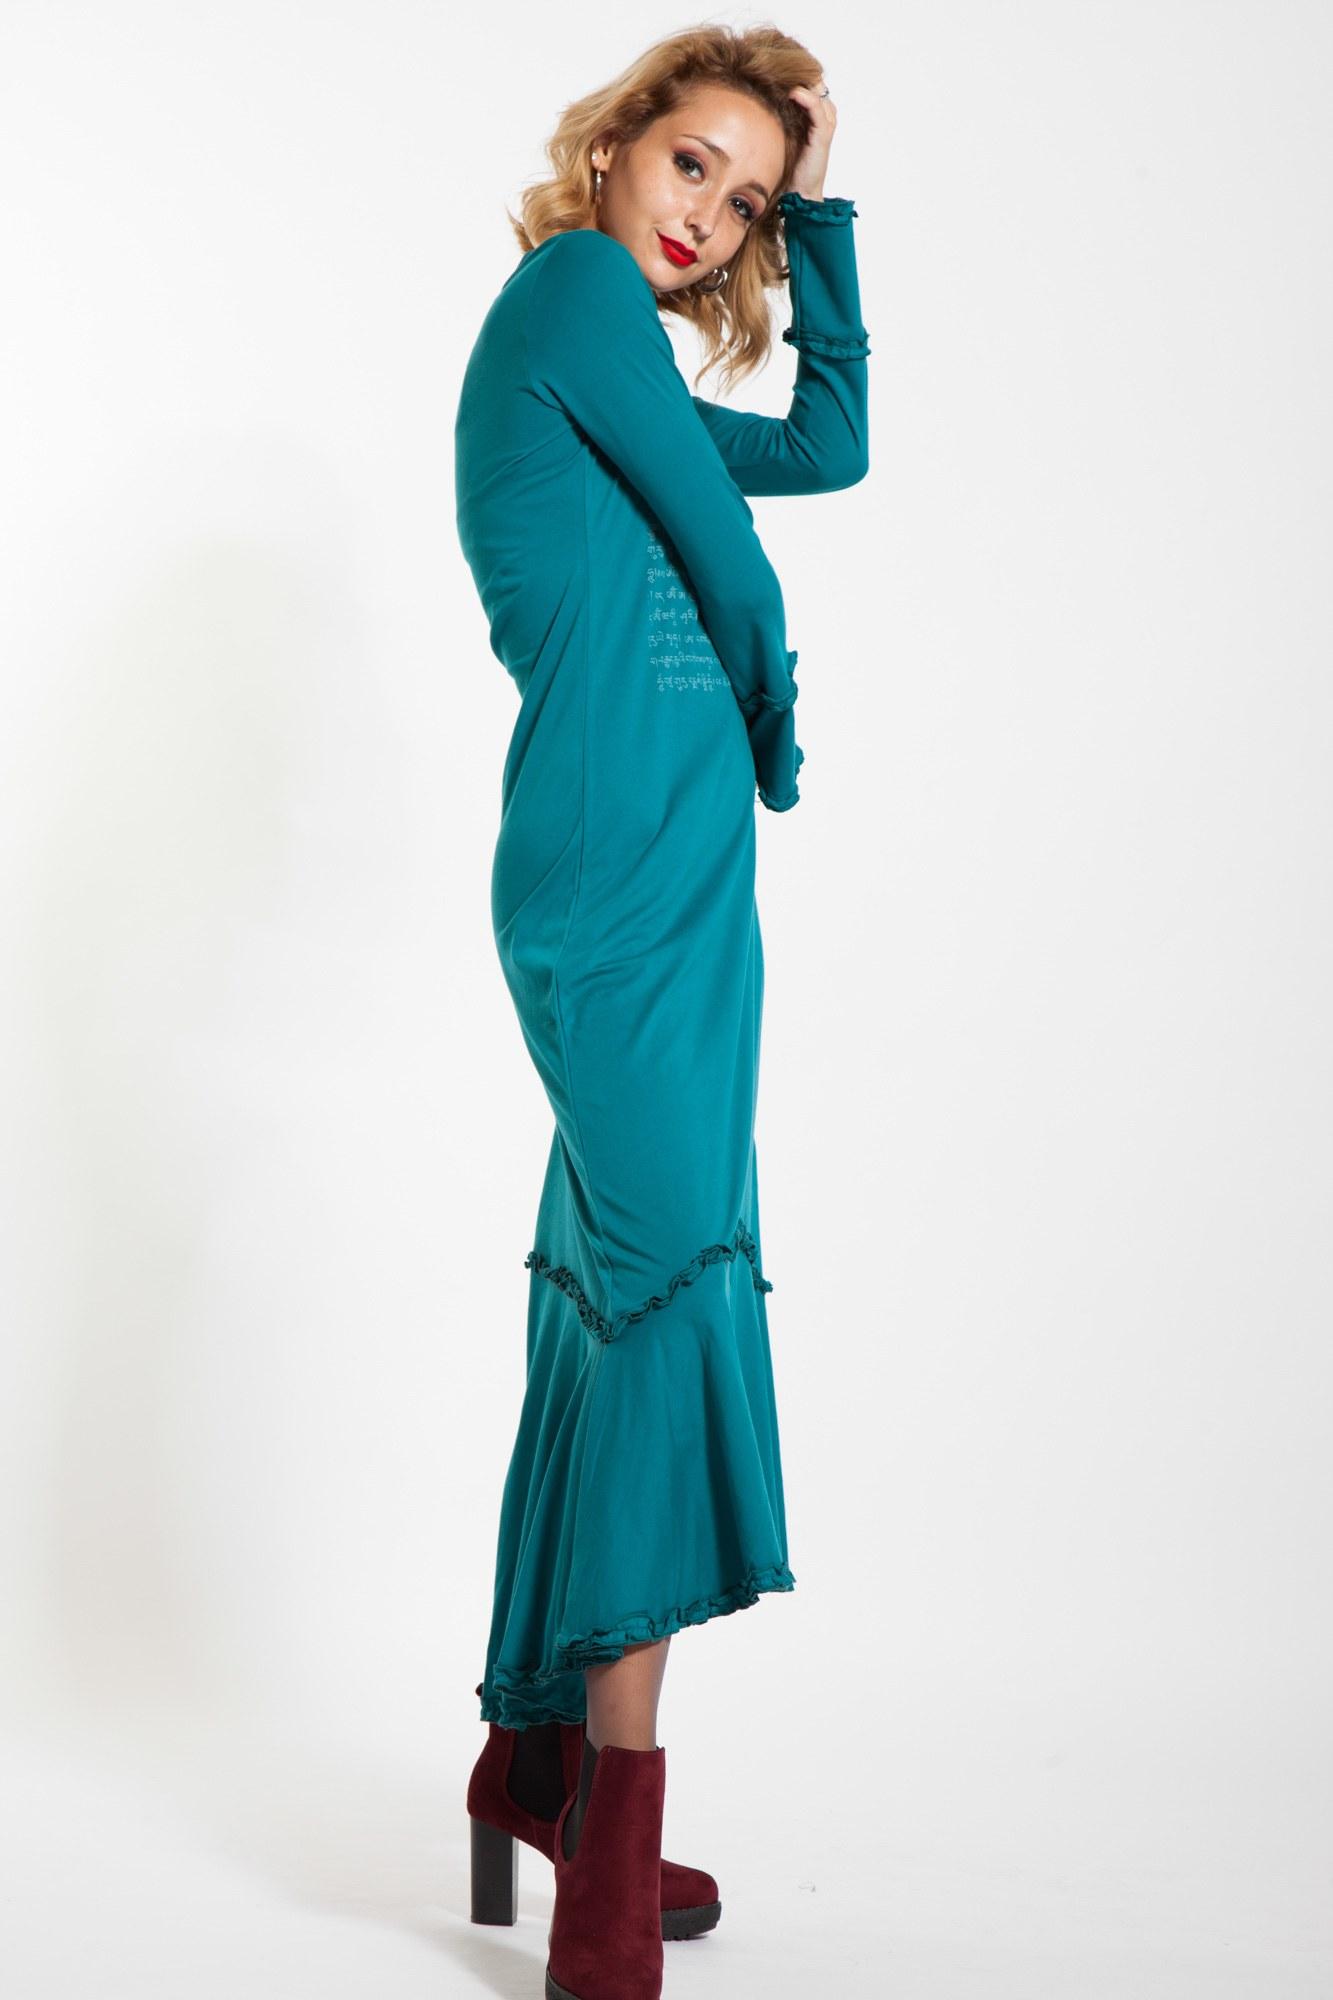 Rochie lunga turcoaz cu mantra tibetana